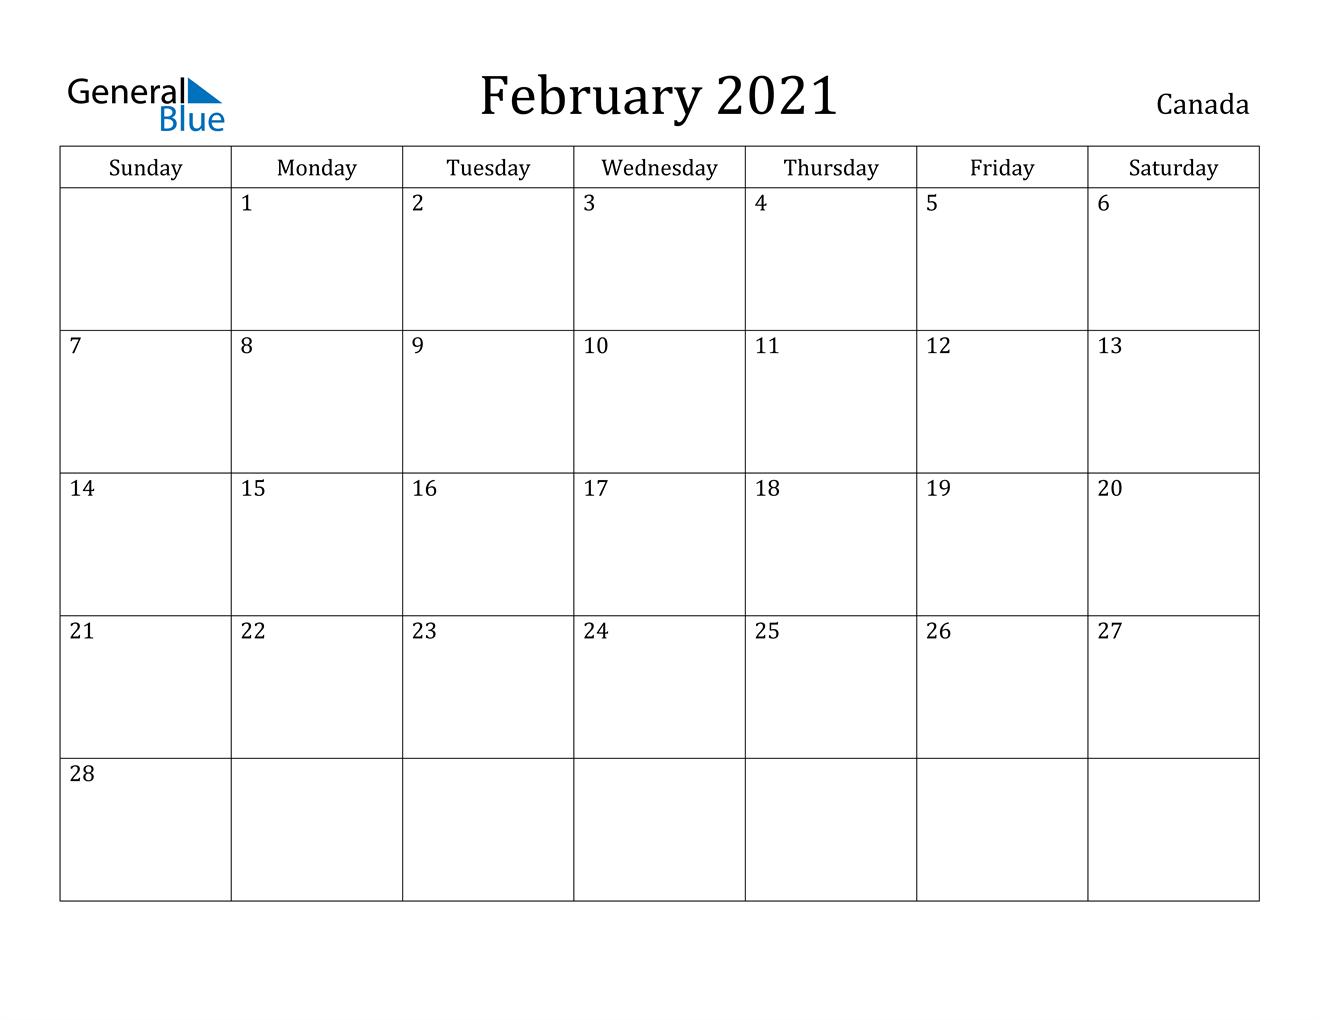 February 2021 Calendar - Canada